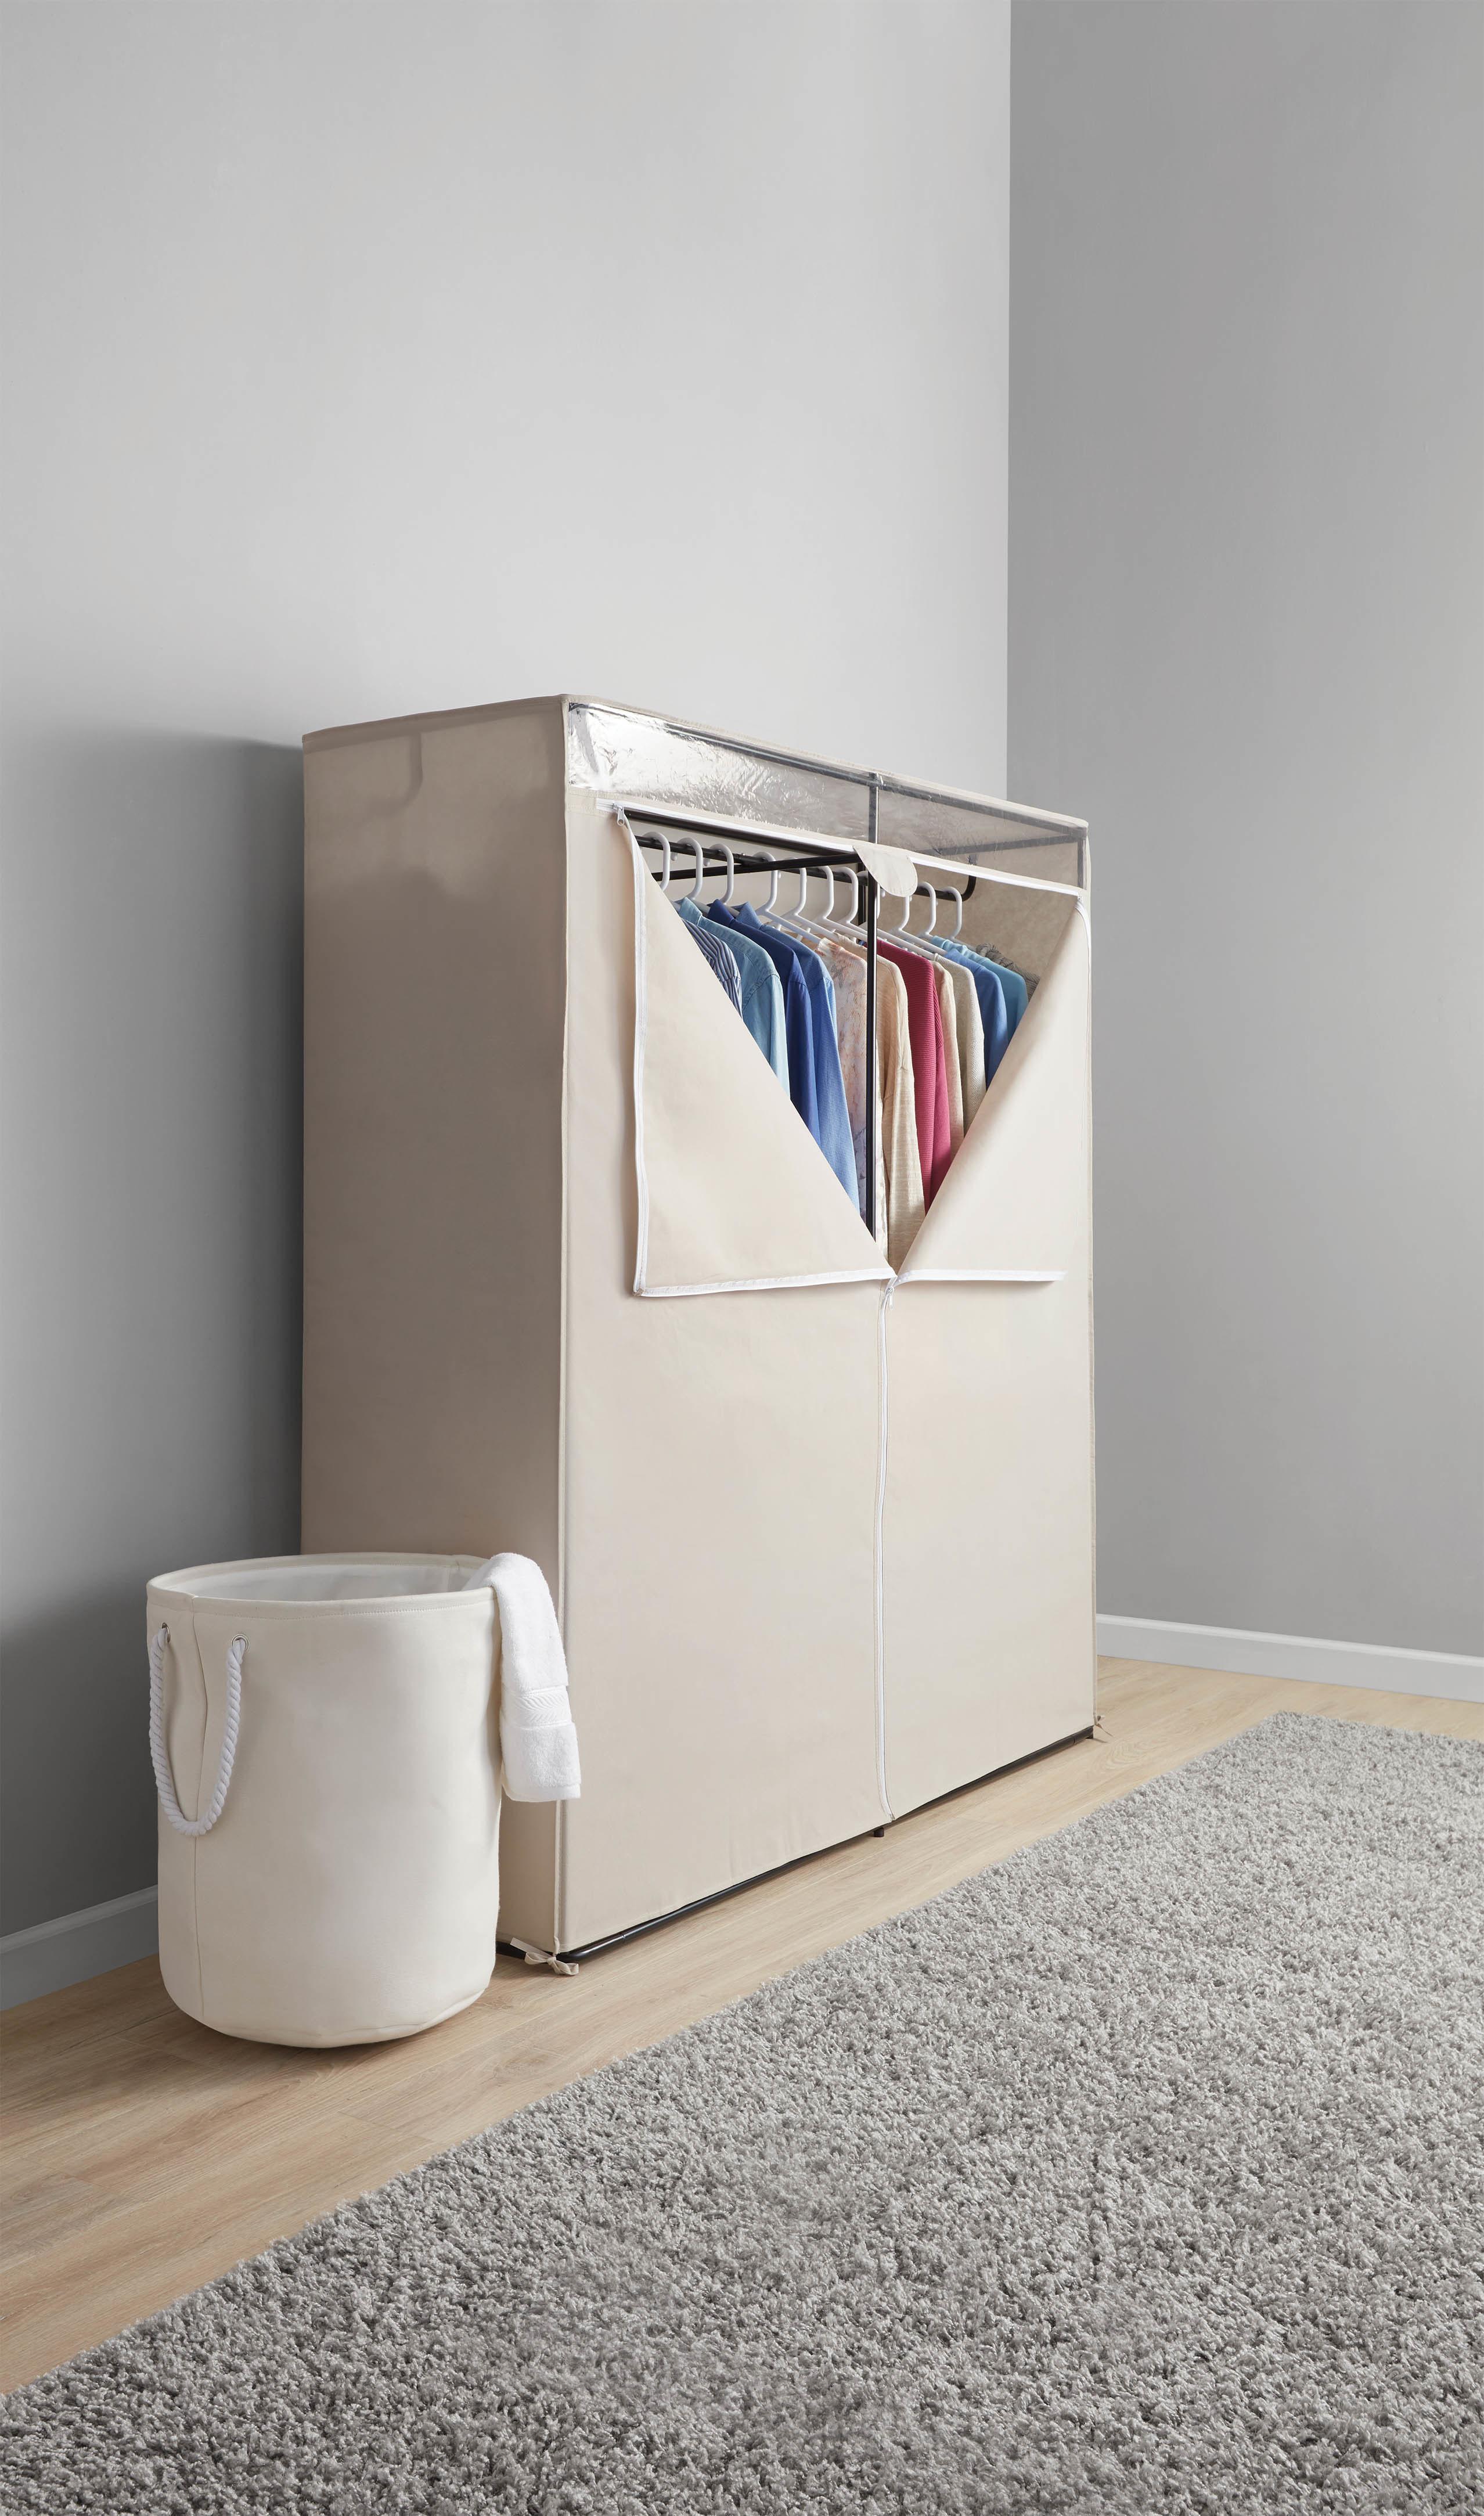 Canvas closet unzippered revealing clothing inside